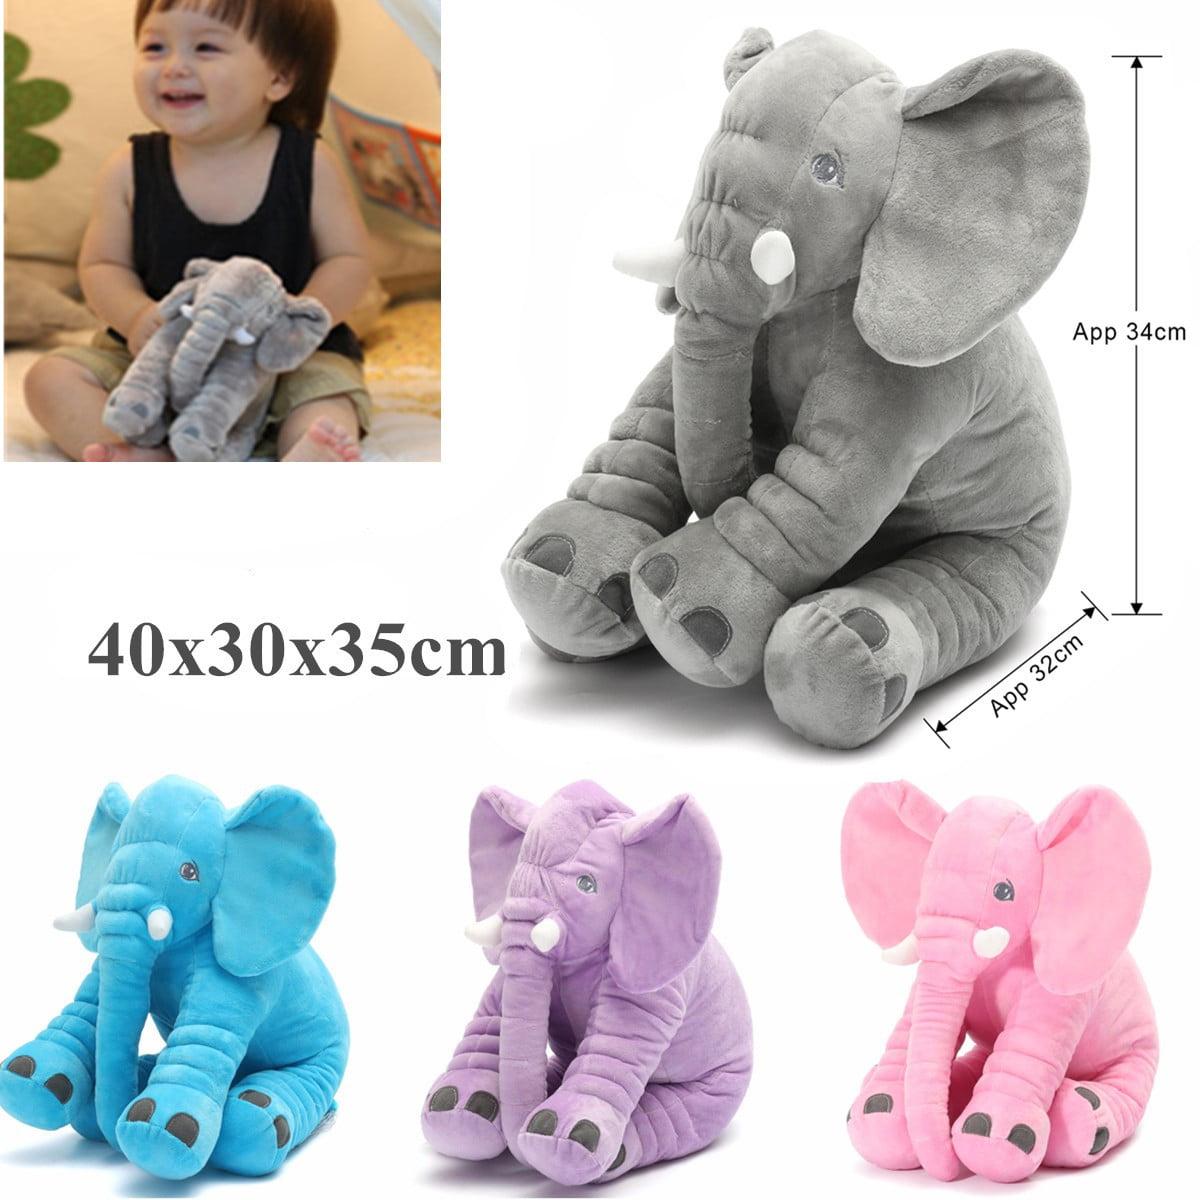 Long Nose Elephant Pillow Doll Toy Baby Sleeping Warm Lumbar Soft Plush Cushion